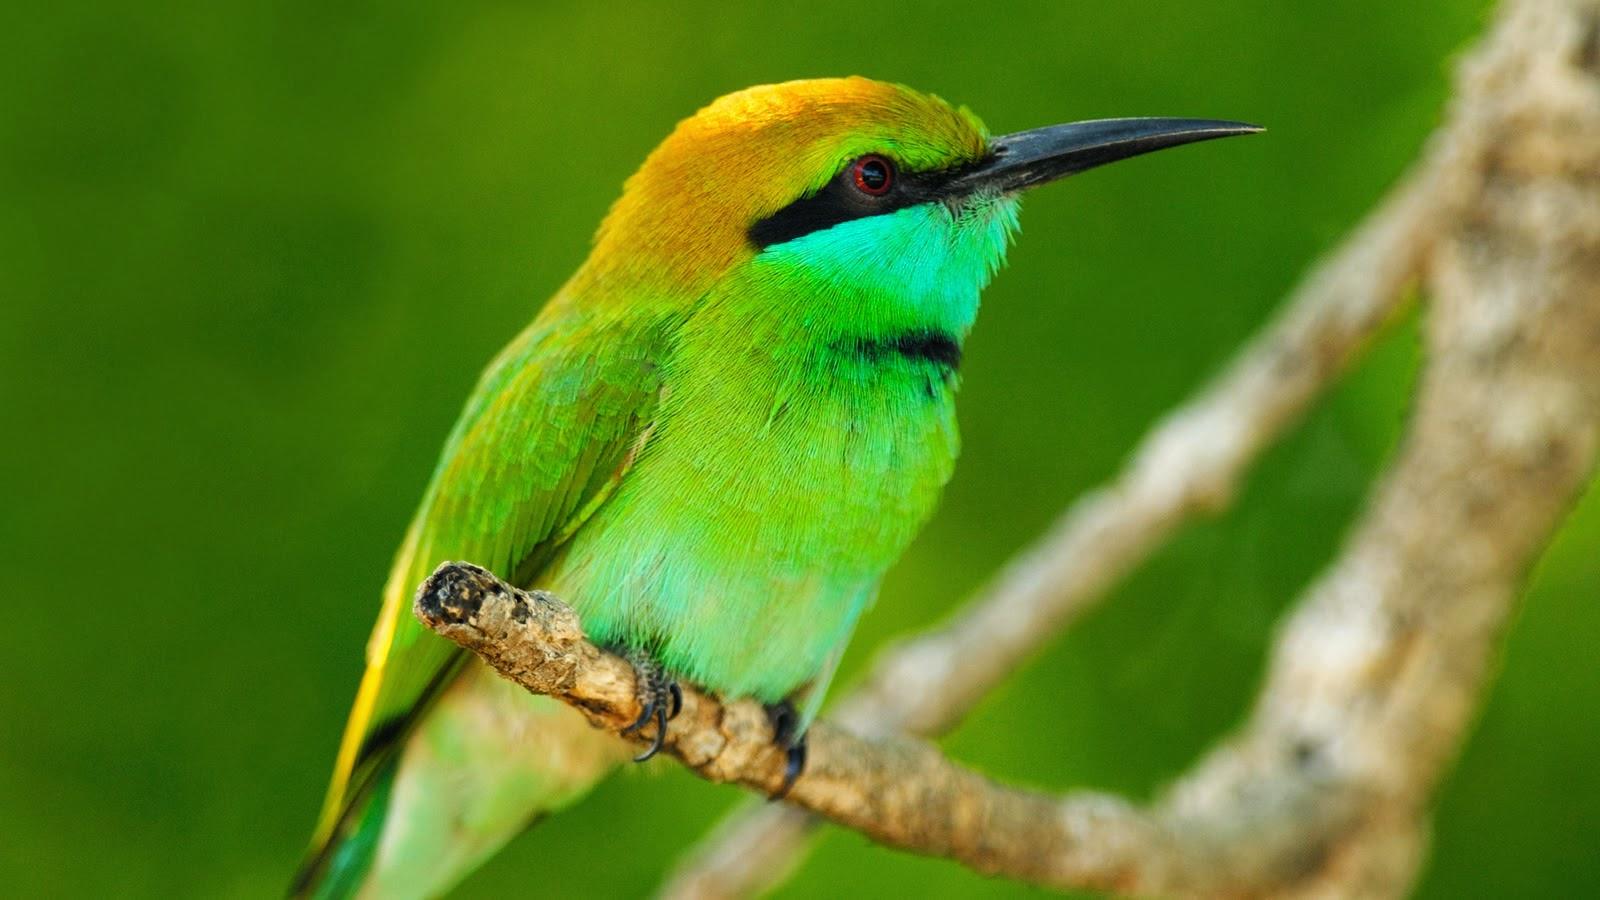 wallpaper islamic informatin site: Animals & birds Wallpapers